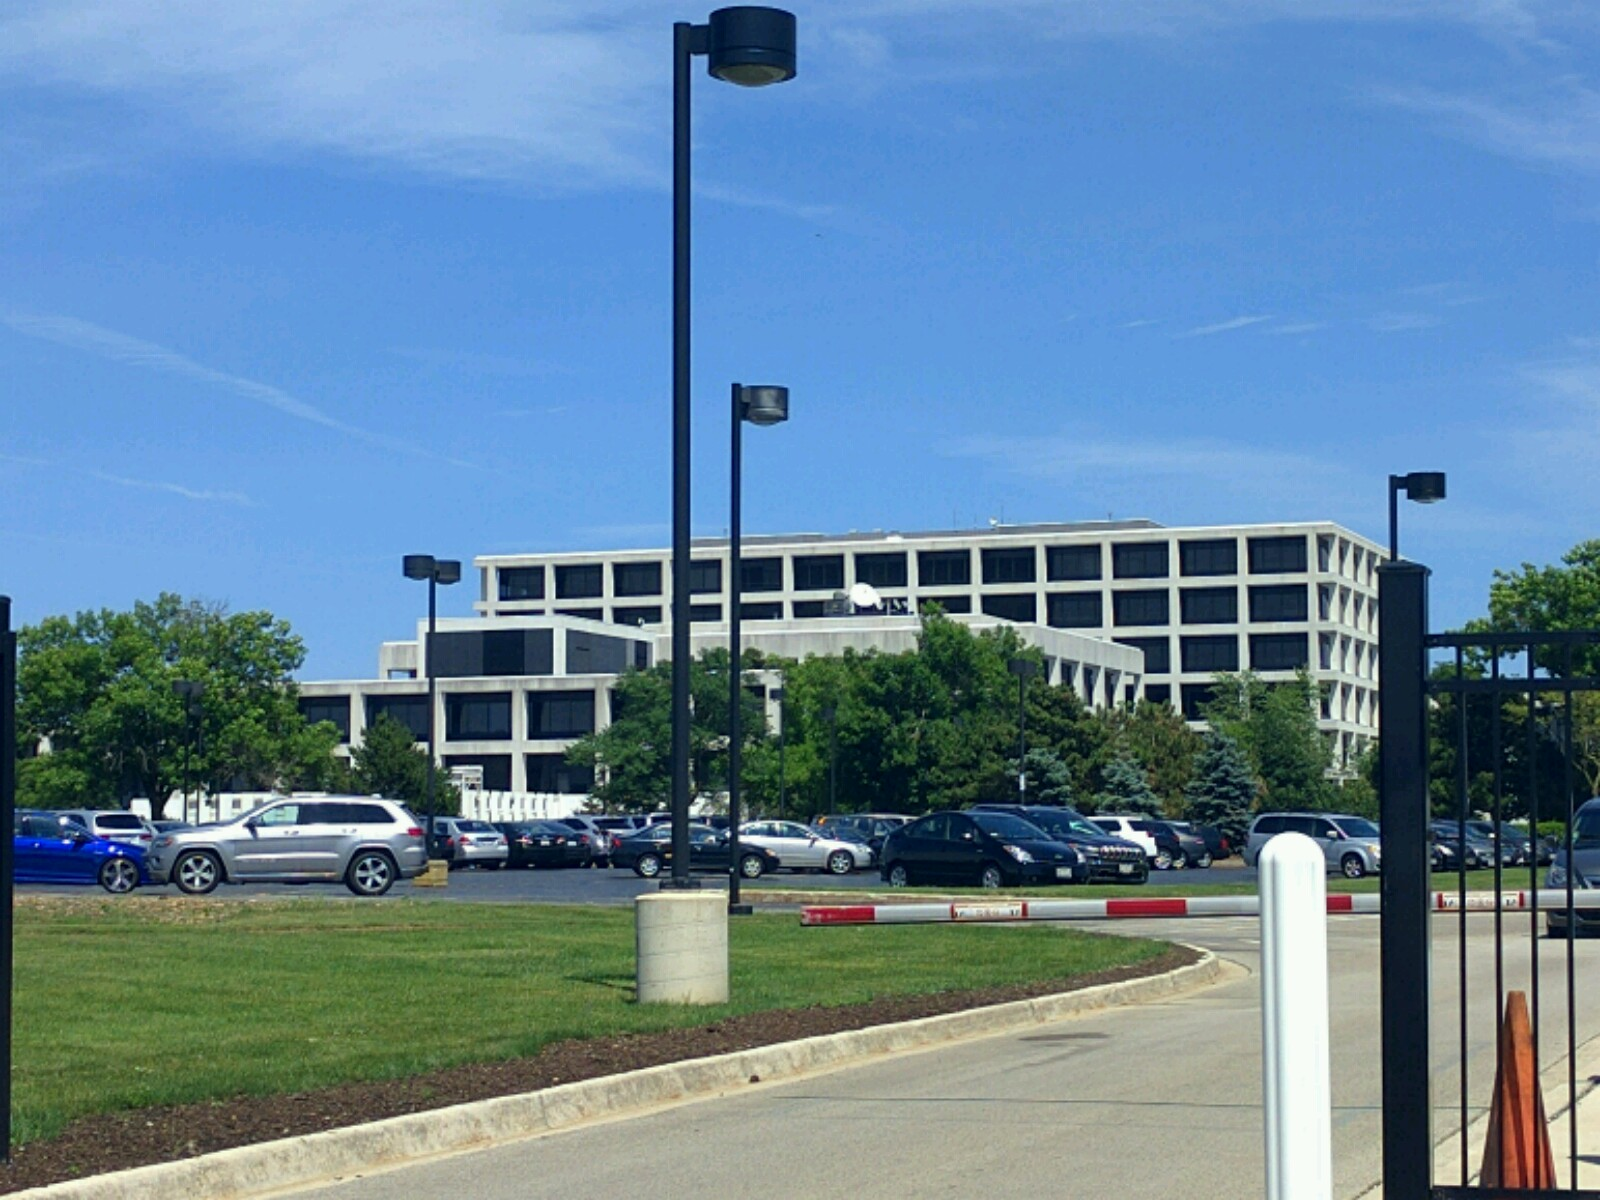 Allstate's corporate headquarters in Northbrook, Illinois.